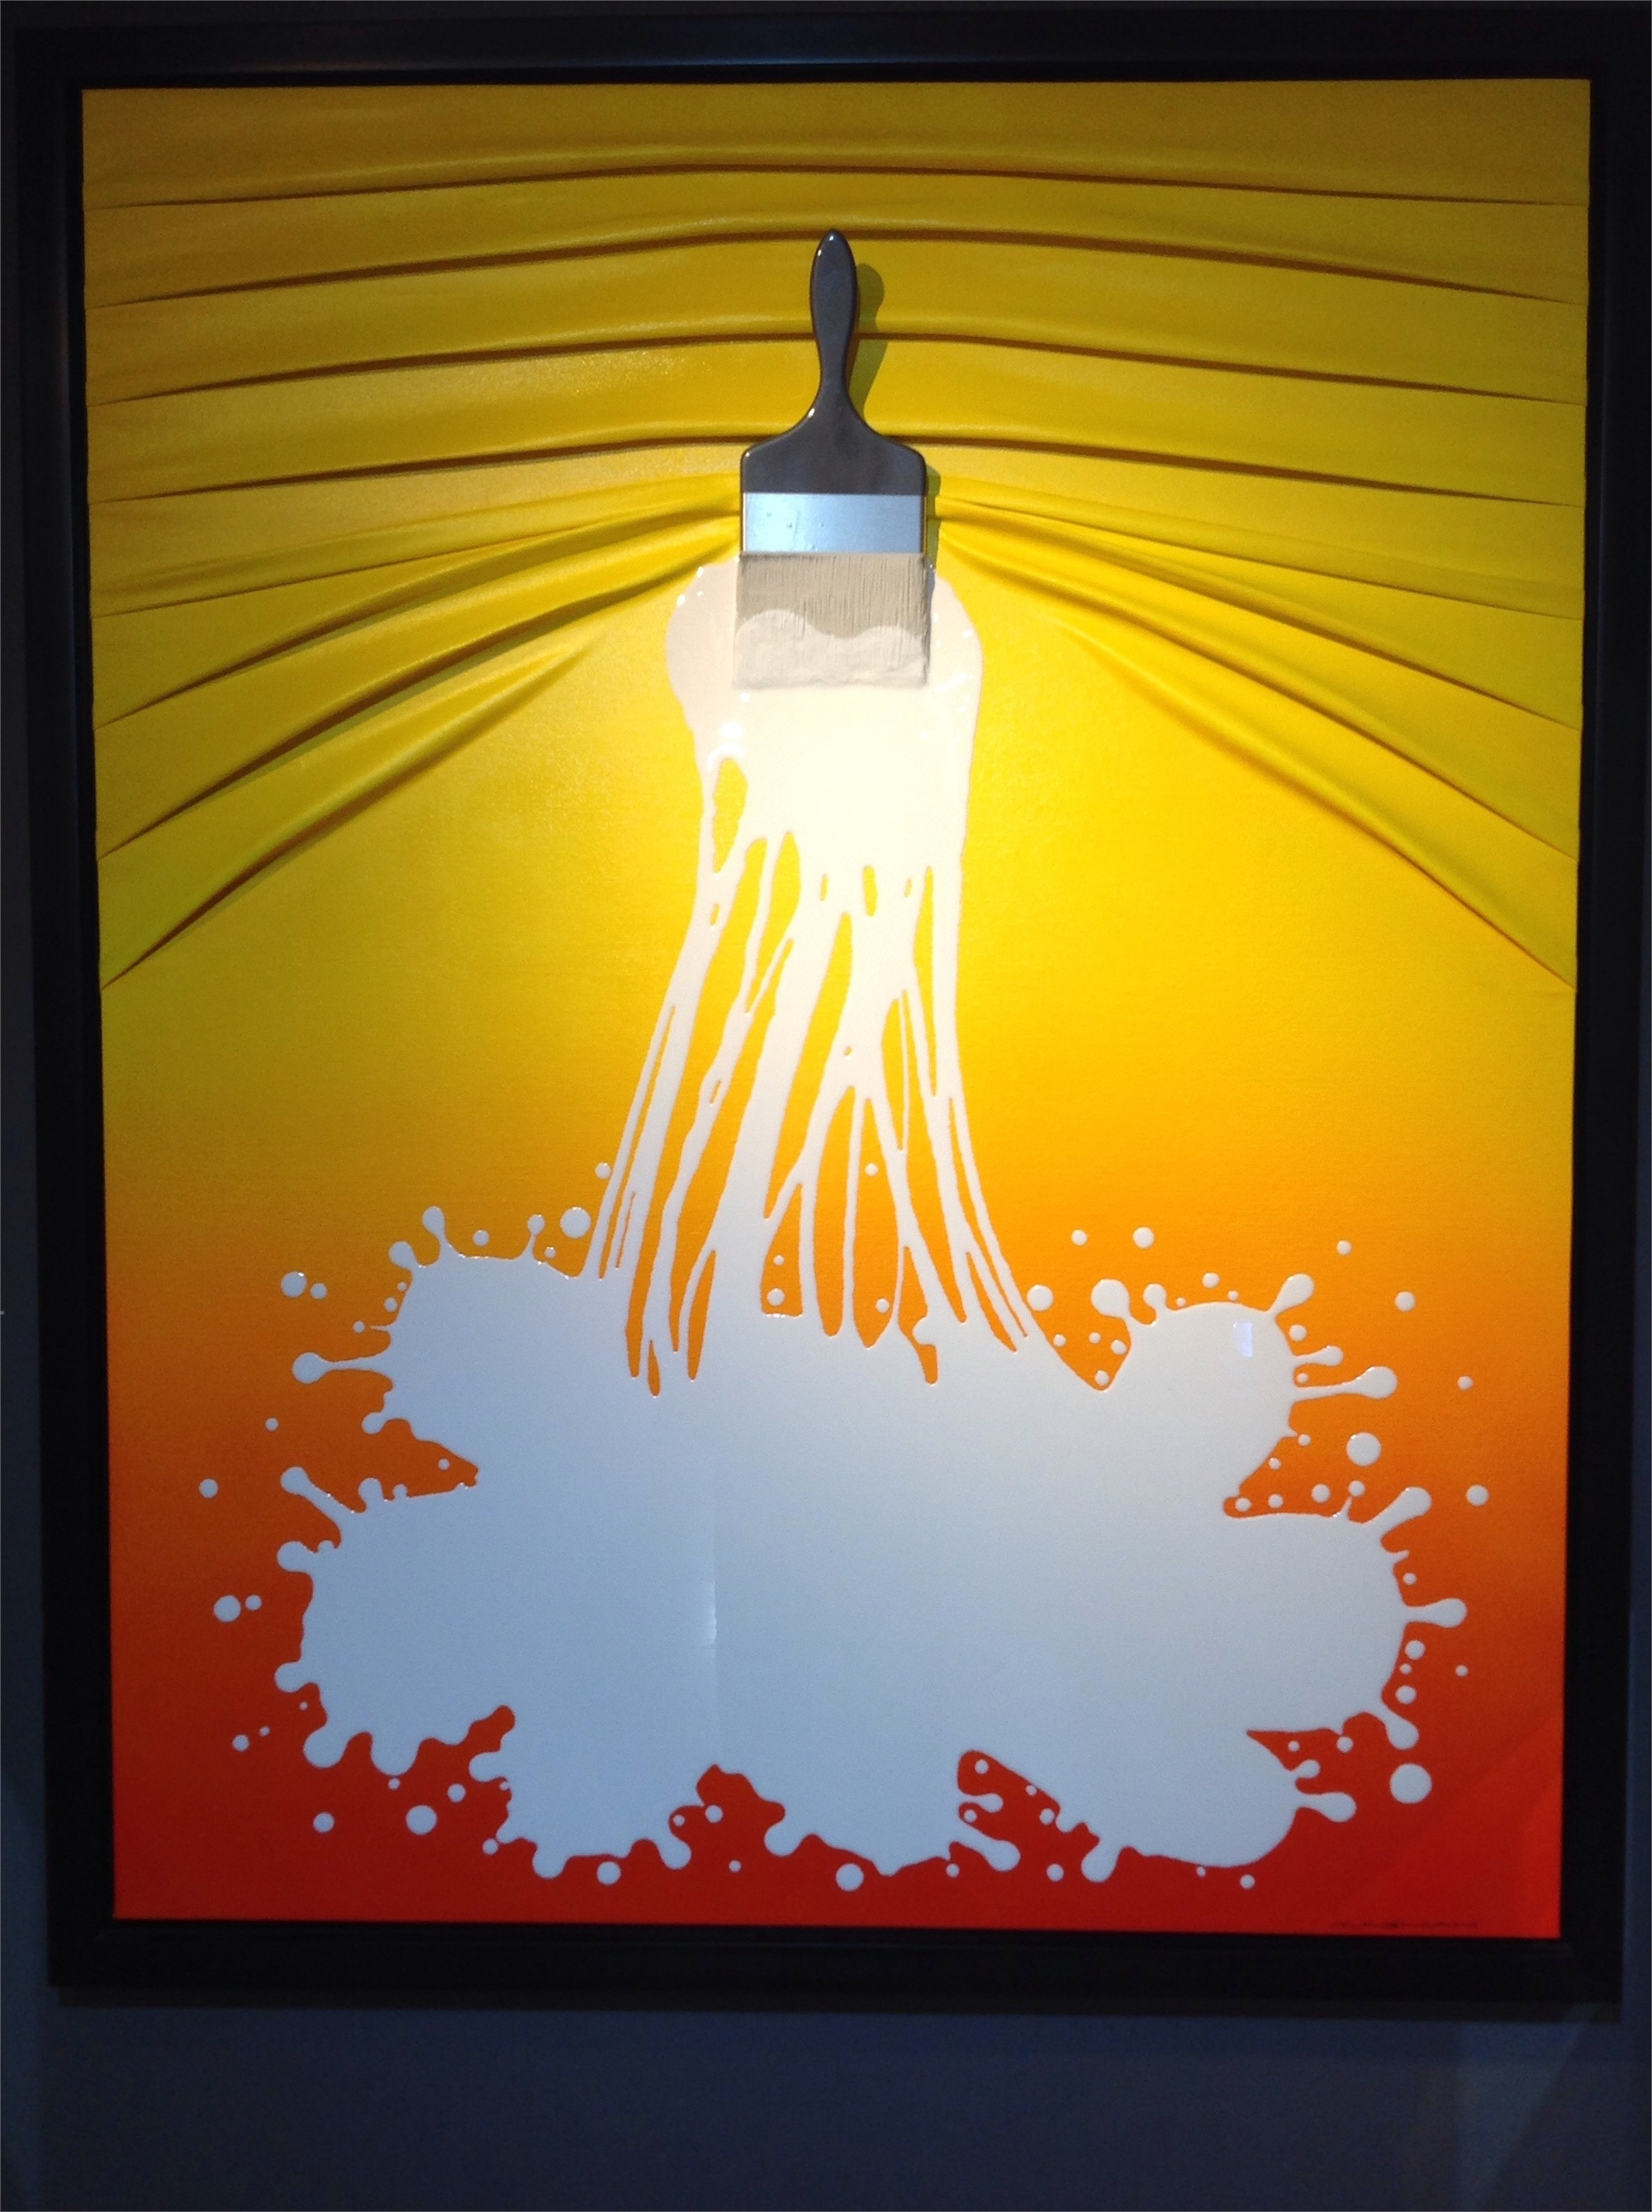 """Lets Paint"" White on Yellow/Orange Ombre by Efi Mashiah"